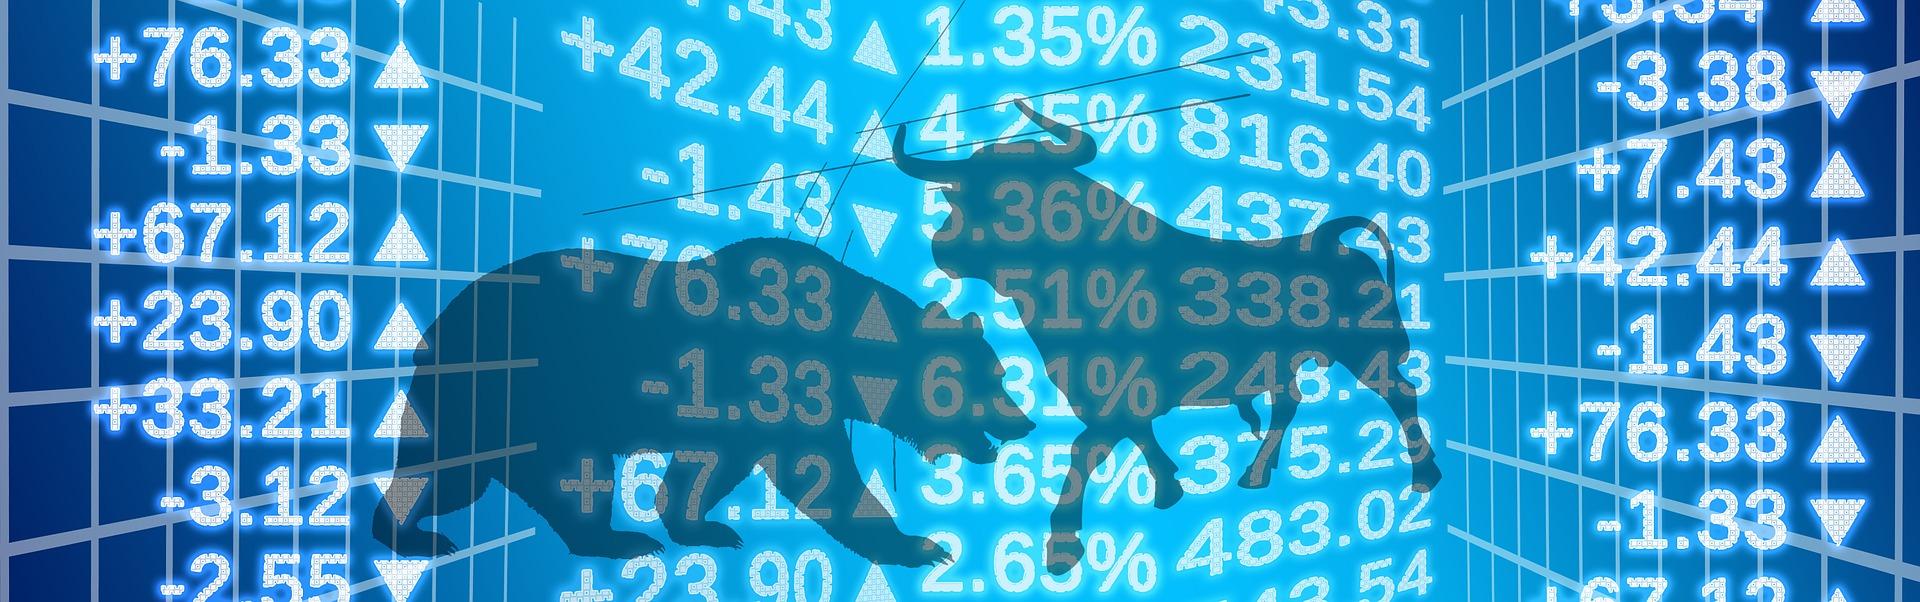 A bull and bear work together in good and bad markets using the Bullish Bounce & Bearish U-Turn stock trading tactics.